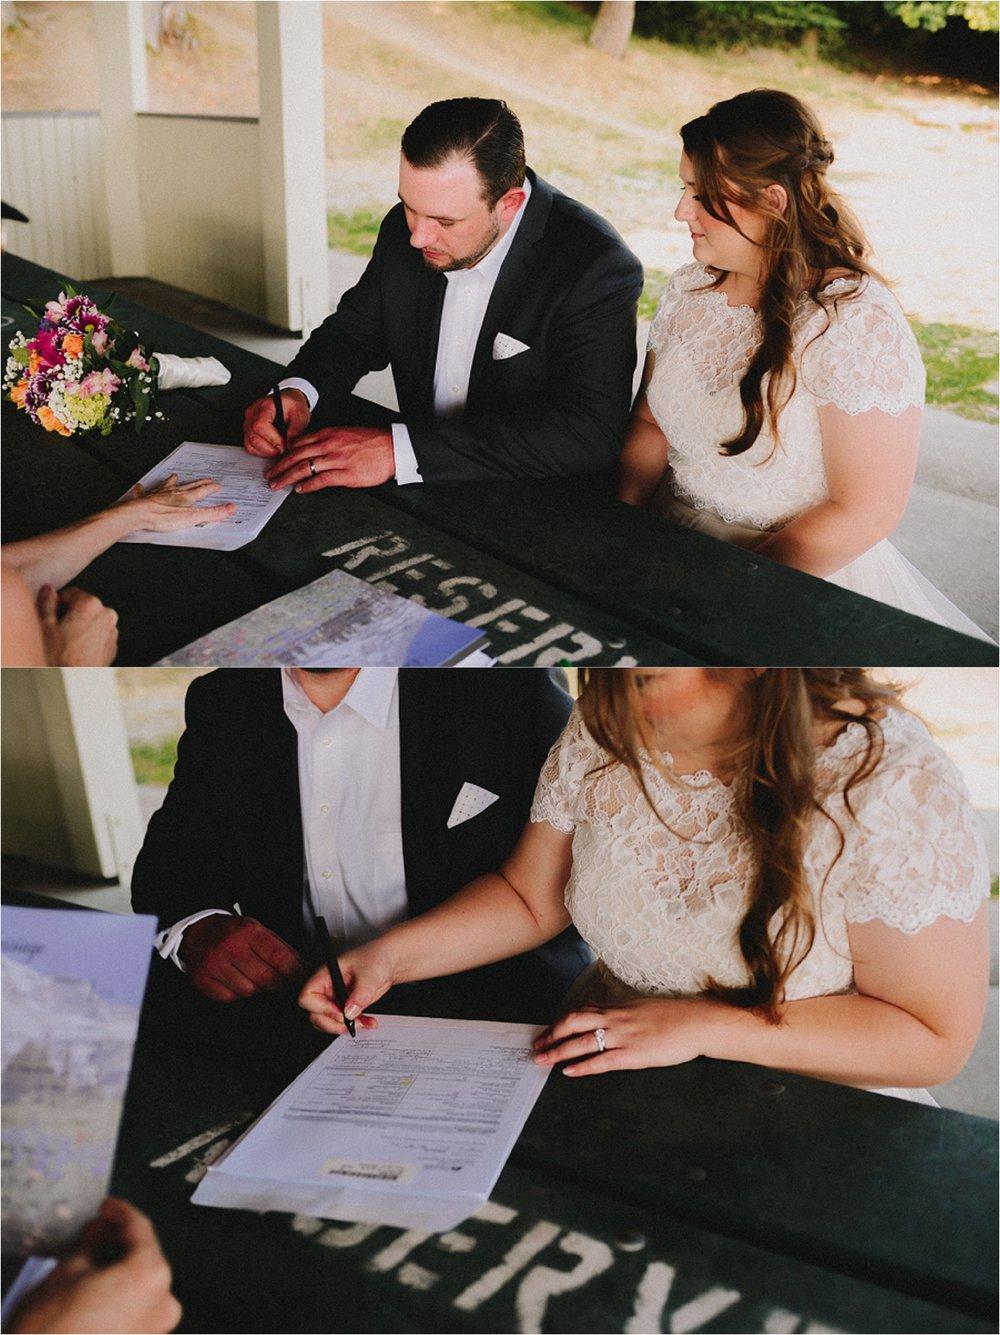 owen-beach-priest-point-park-tacoma-washington-elopement-jannicka-mayte-anchorage-alaska-wedding-elopement-photographer (54).jpg